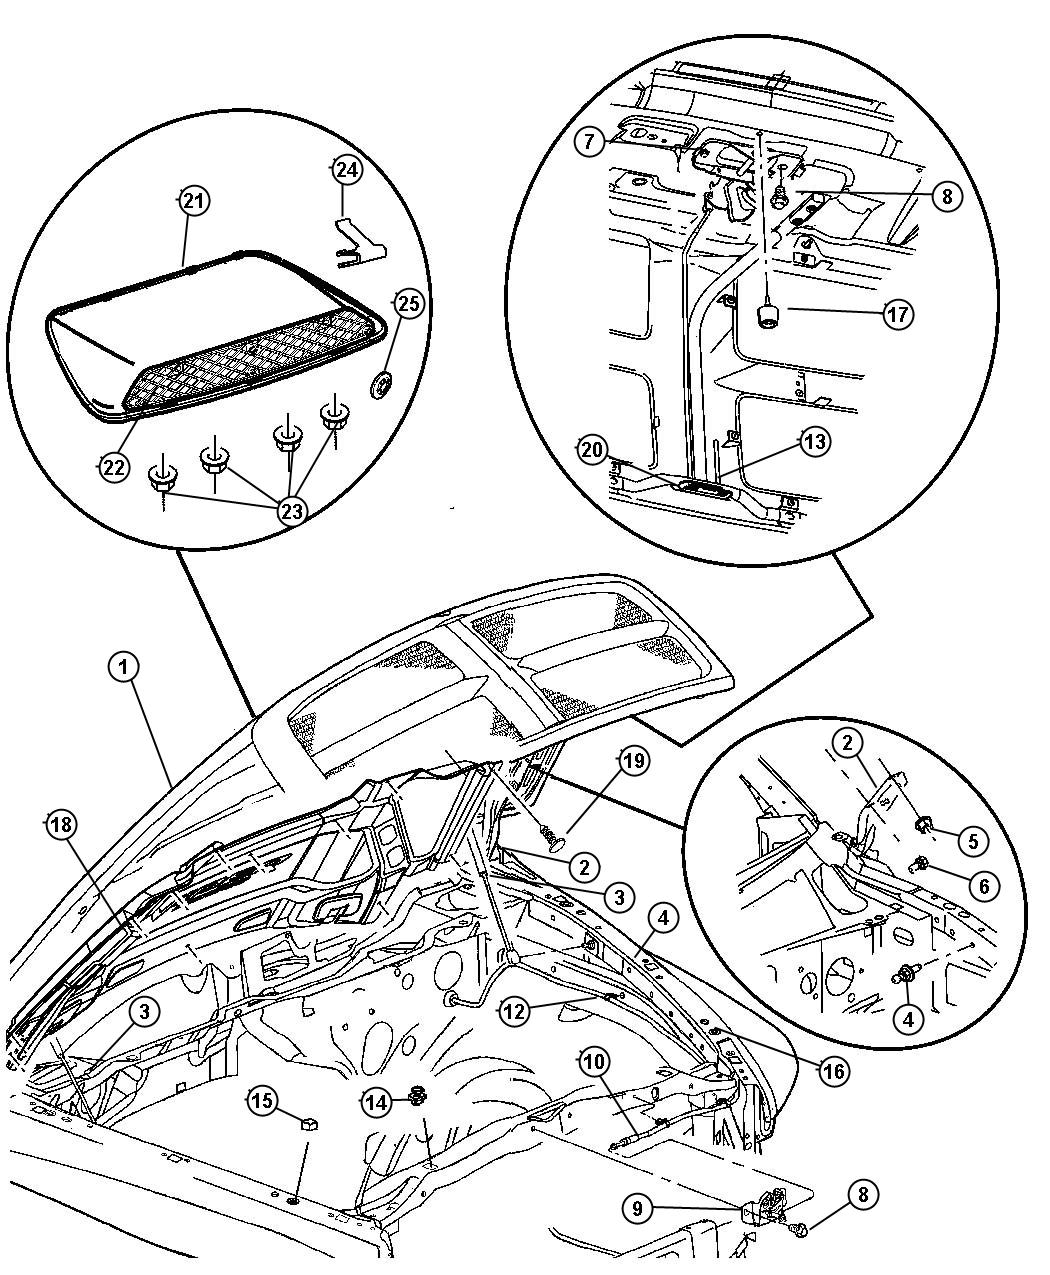 2006 Dodge Ram 1500 Striker. Hood latch. Includes rod clip